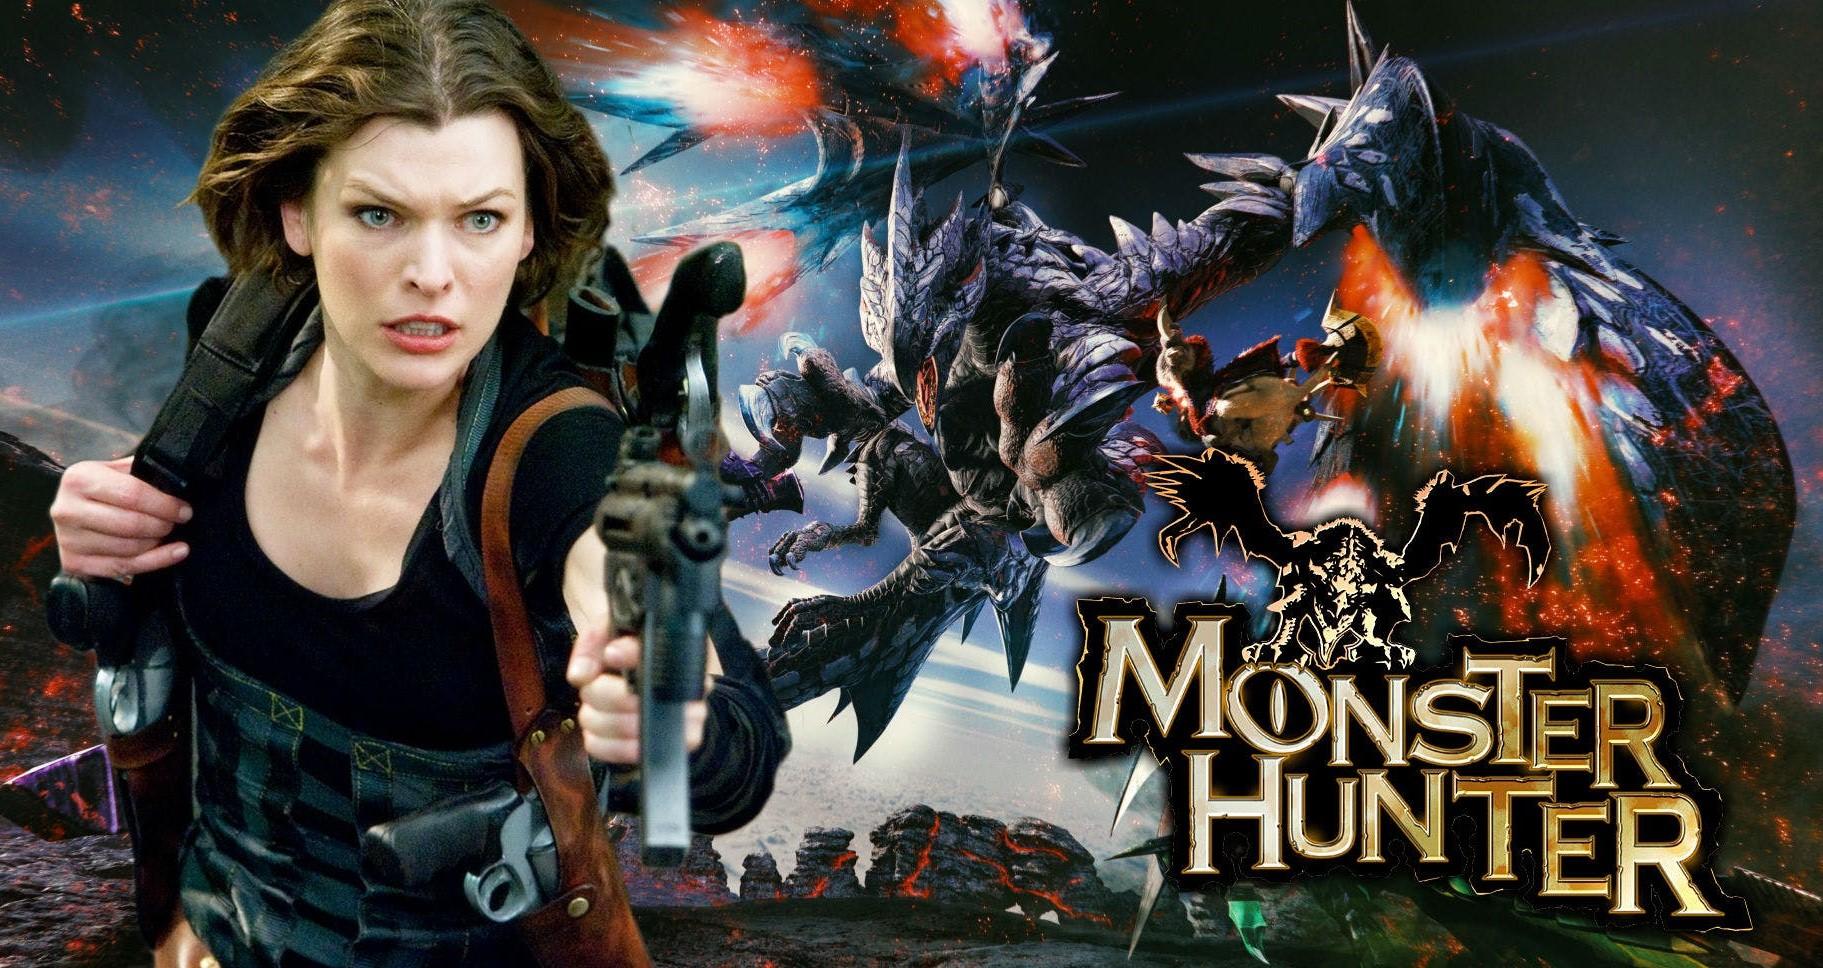 Милла Йовович и Рон Перлман на съёмках фильма по Monster Hunter